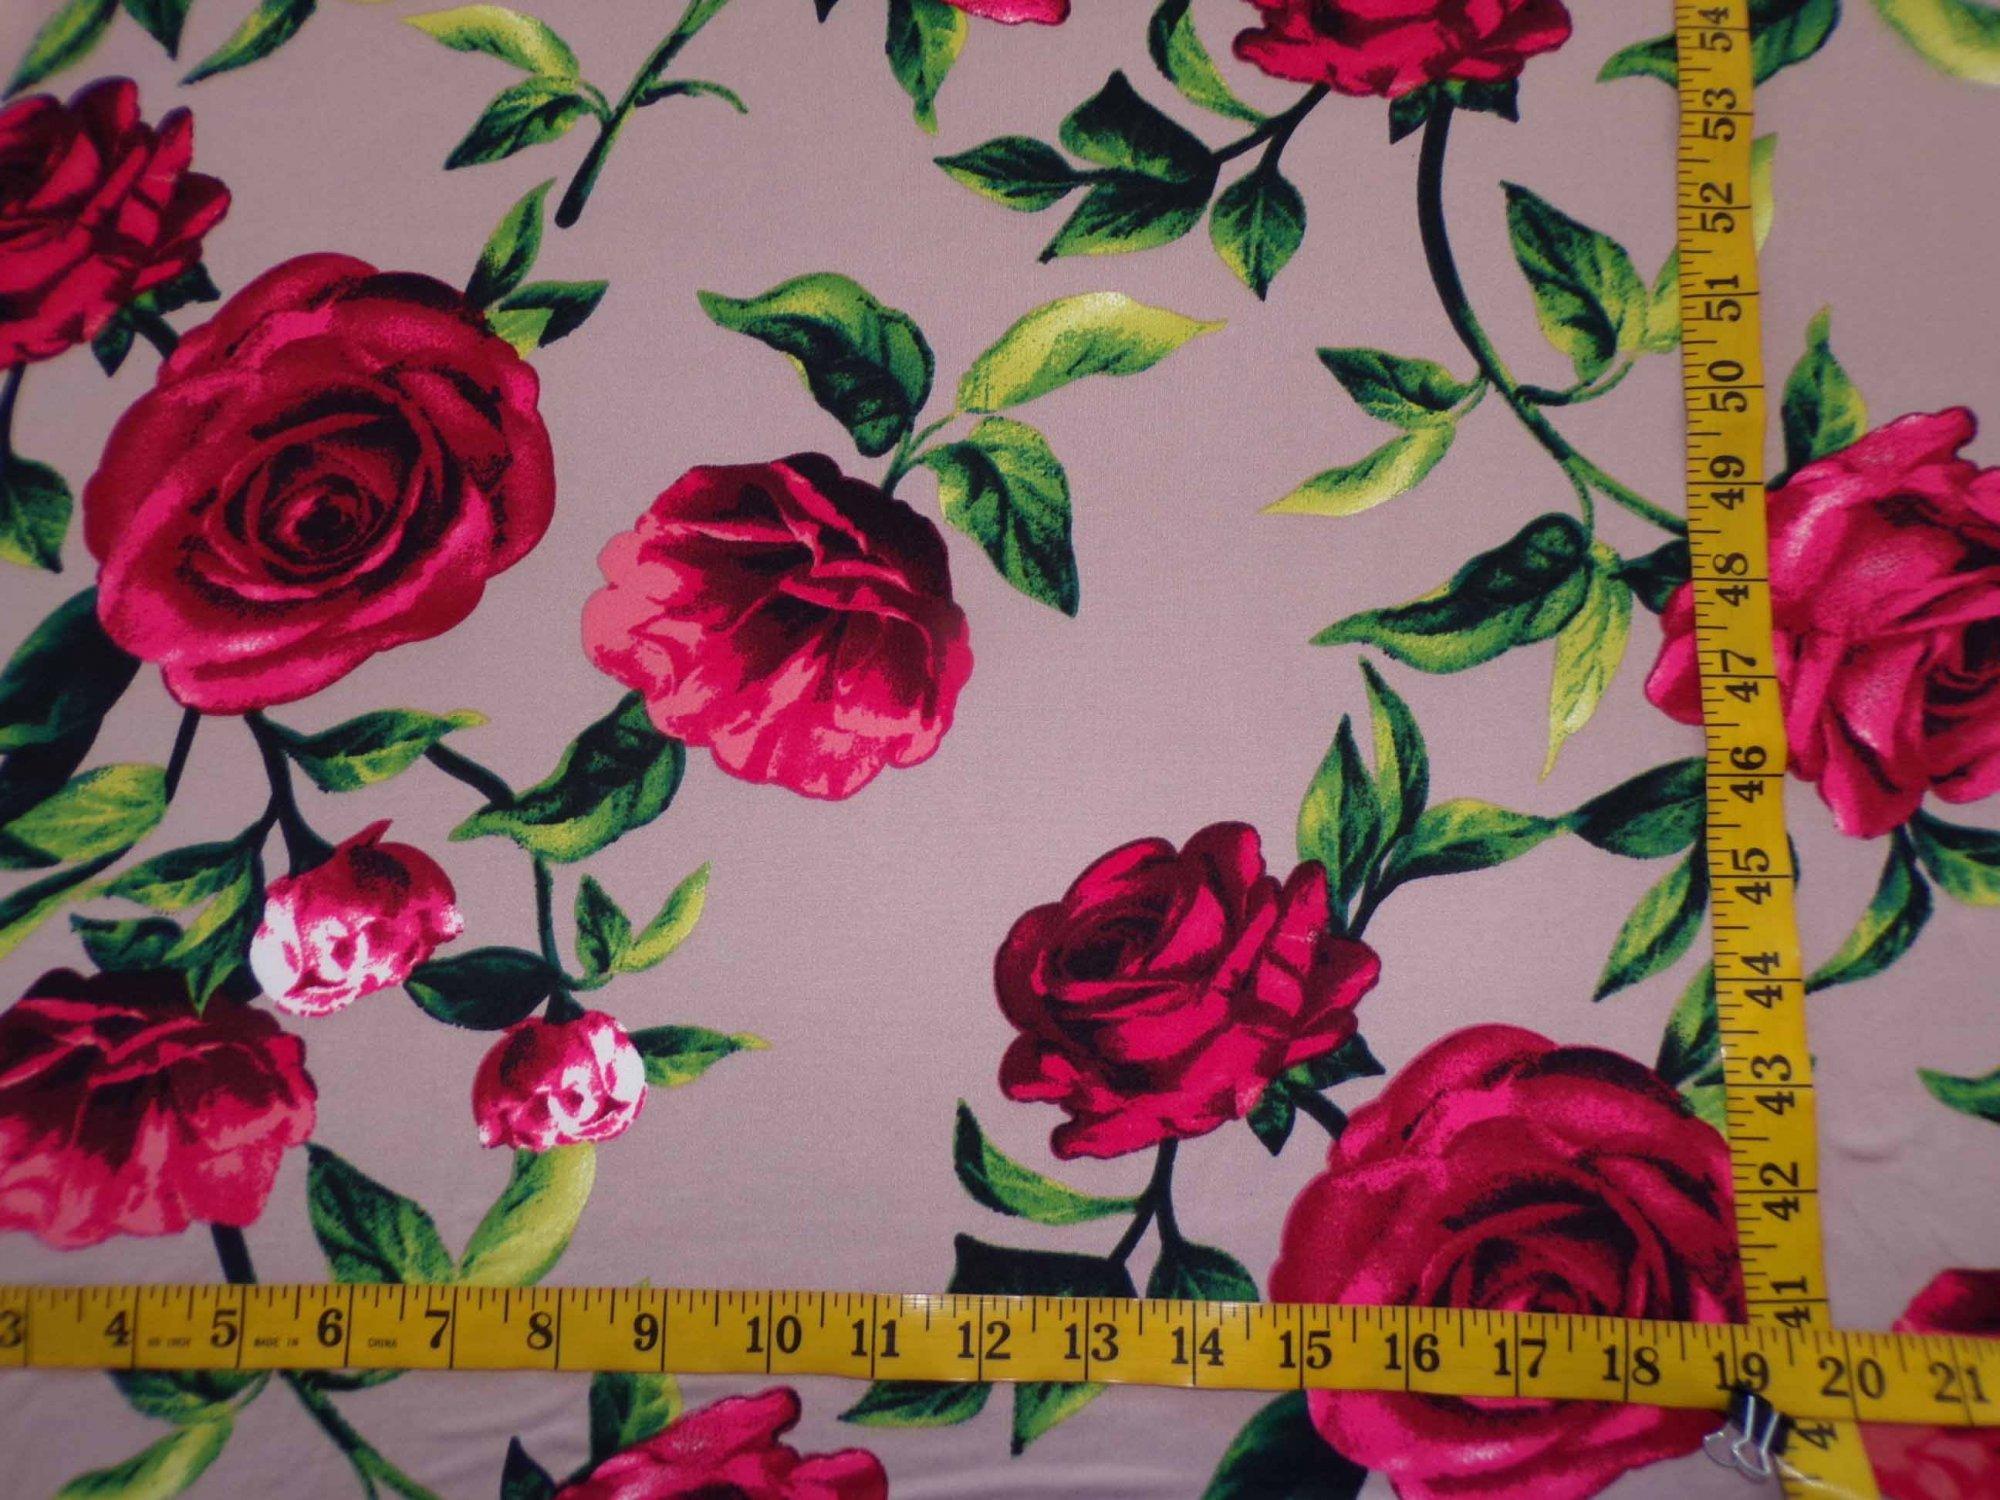 Milana (DBP) - Tan with Large Roses